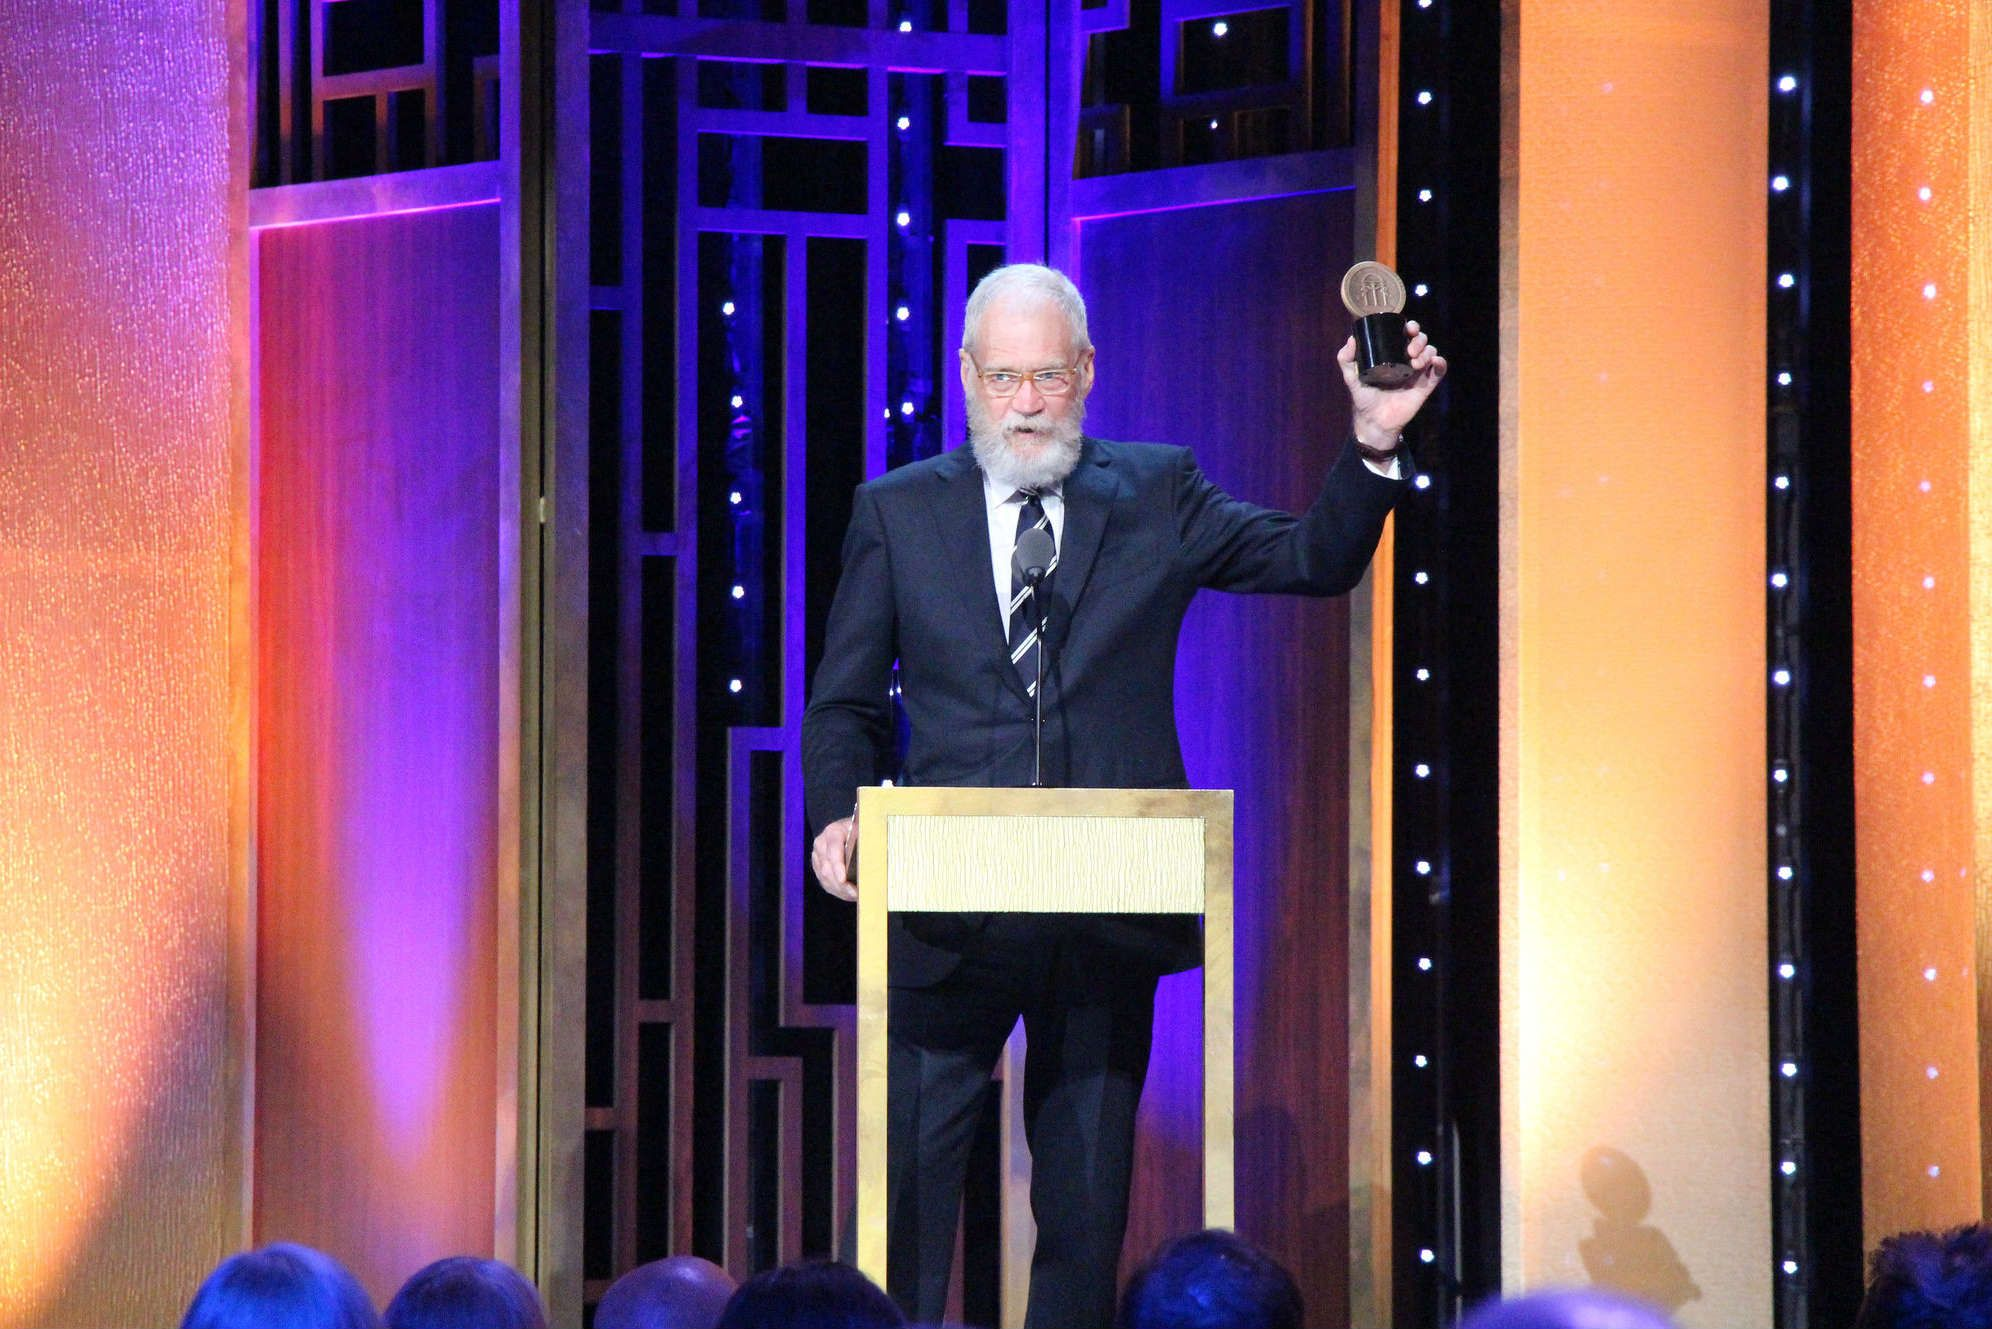 David-Letterman-Netflix-show